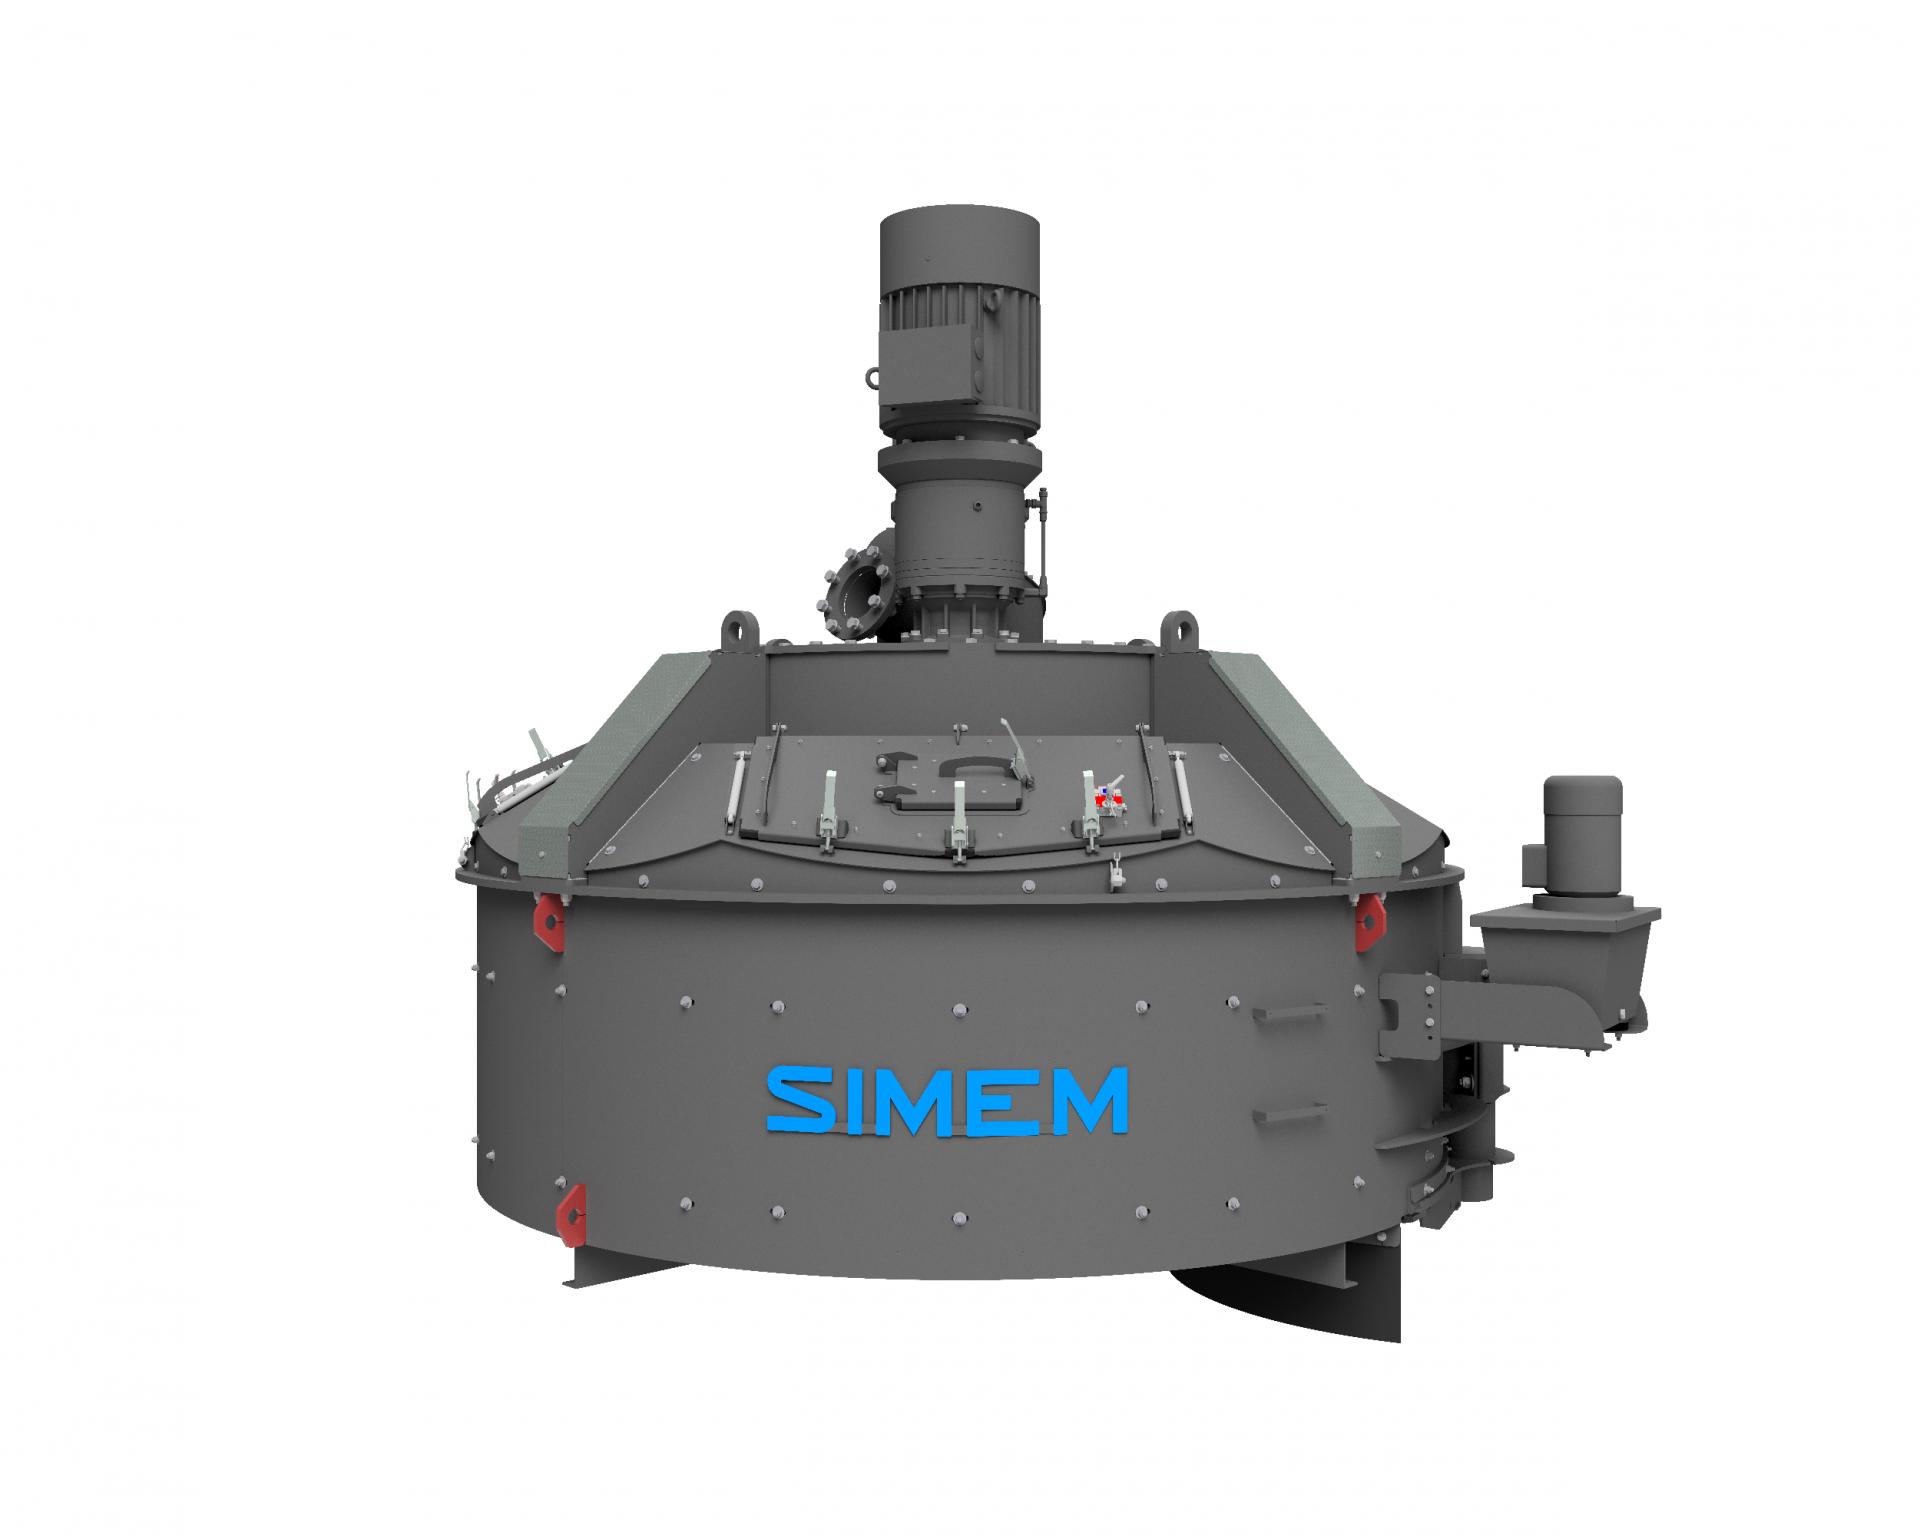 Simem Xentrix planetary mixer